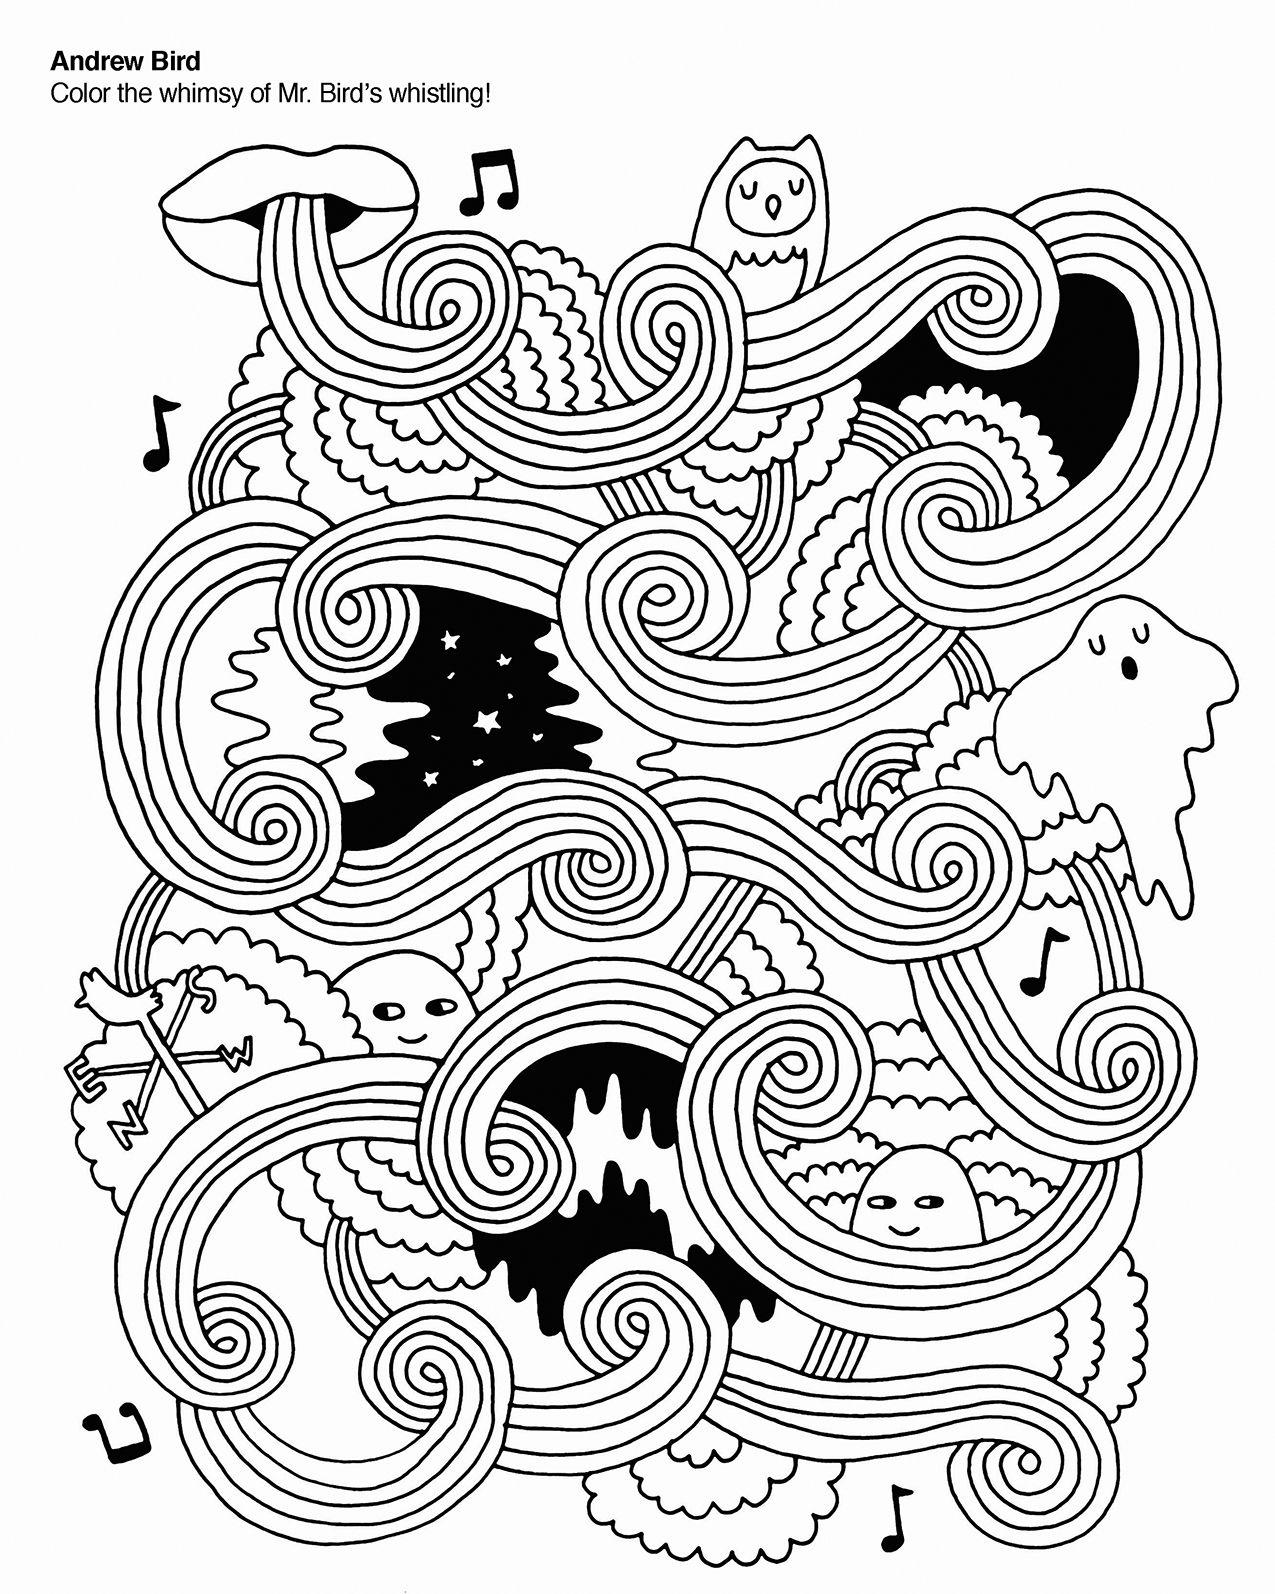 coloringbook-indierock-andrewbird.jpg (1275×1594) | Coloring for ...